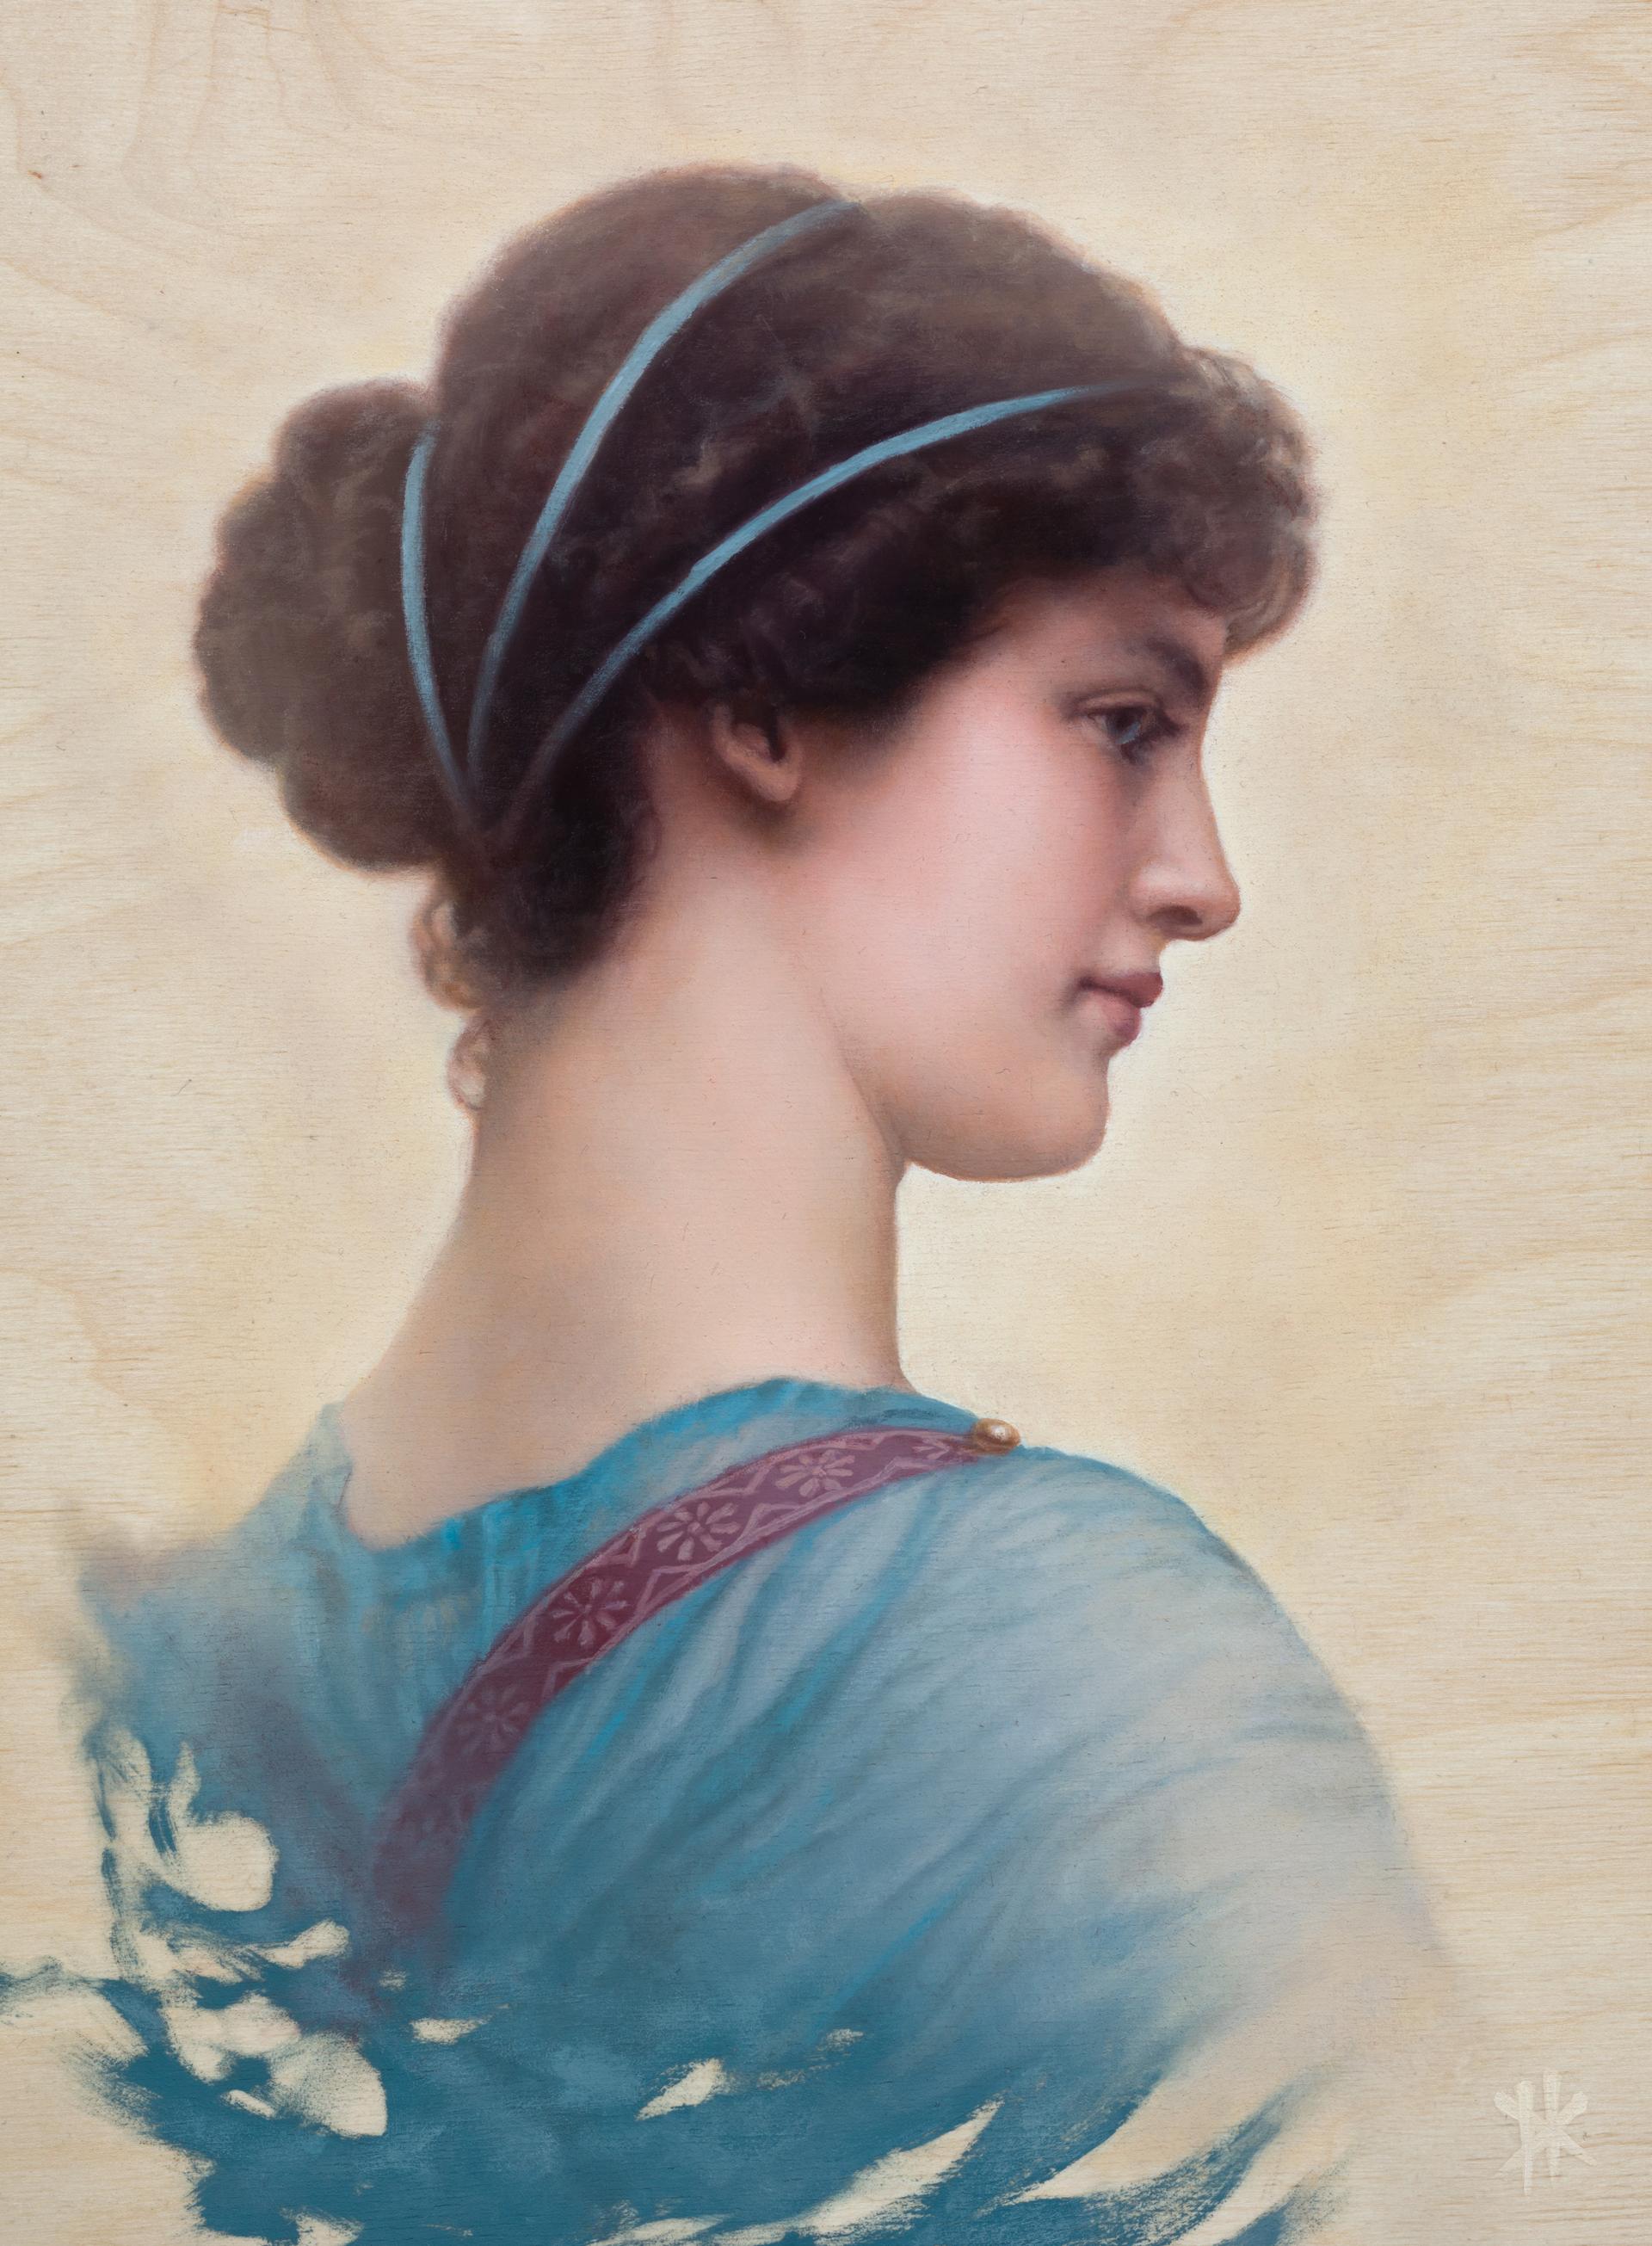 A Classical Beauty (From Godward) by Patrick Kramer